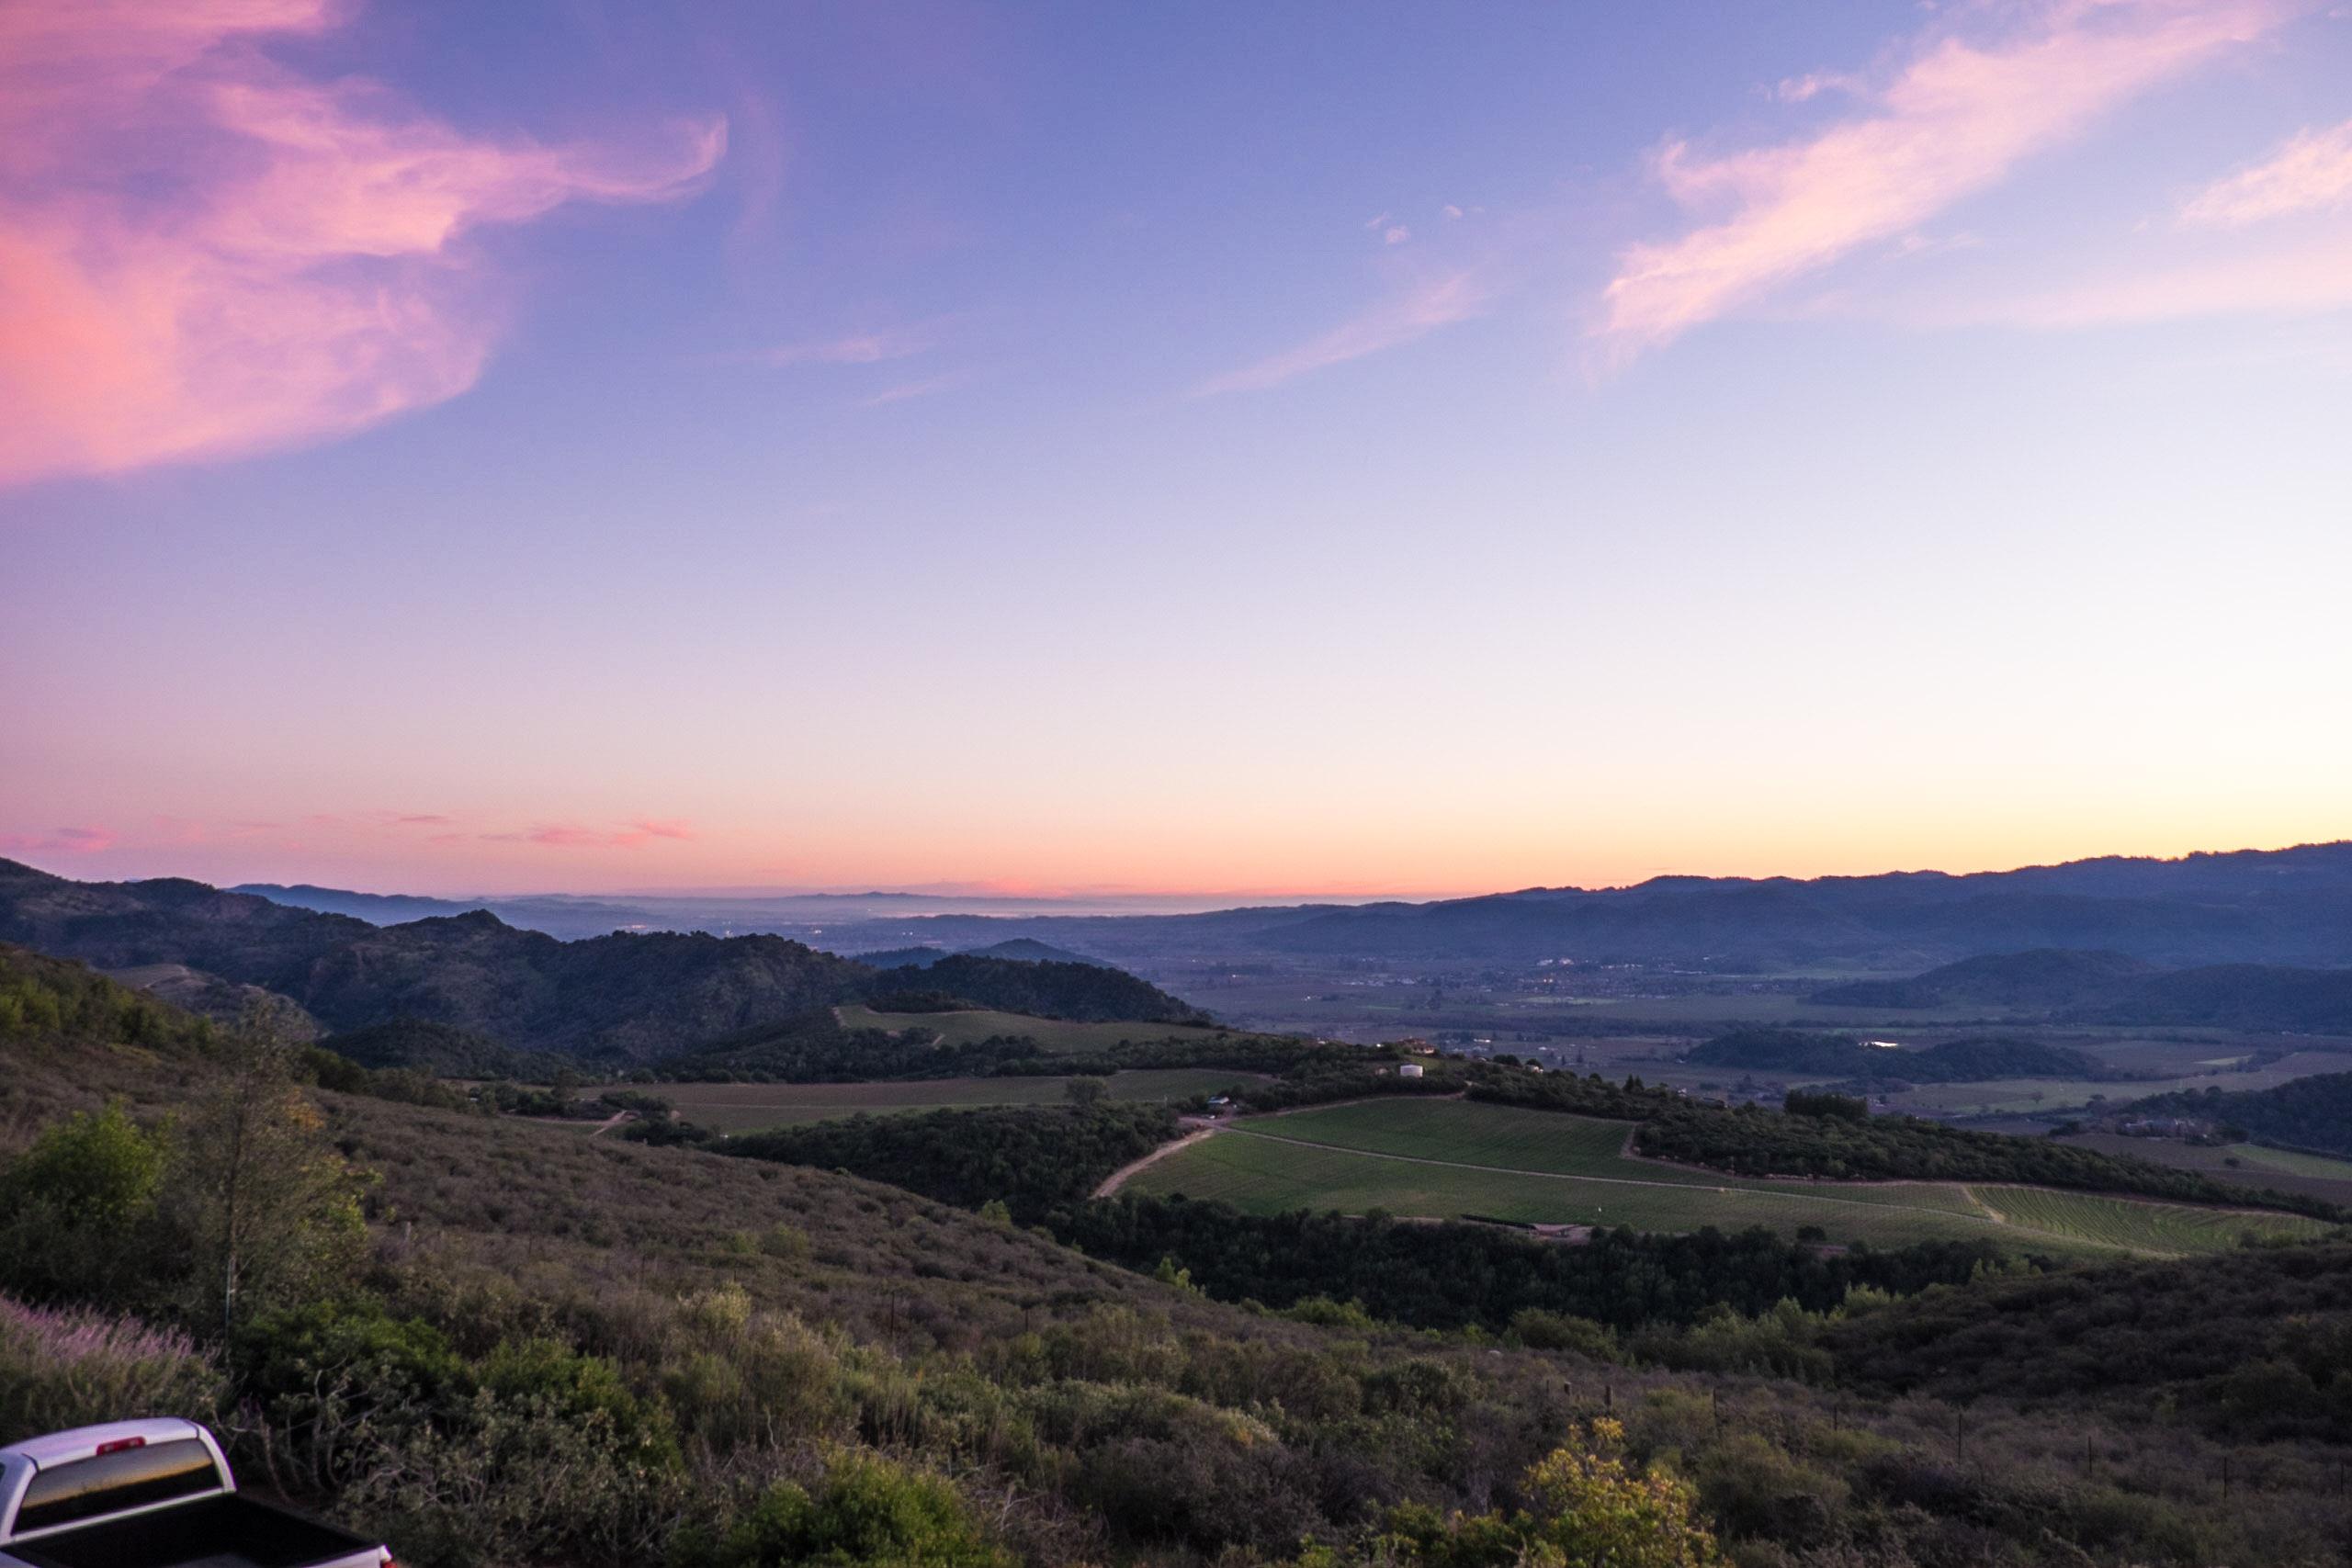 Sunset, Ovid Vineyards